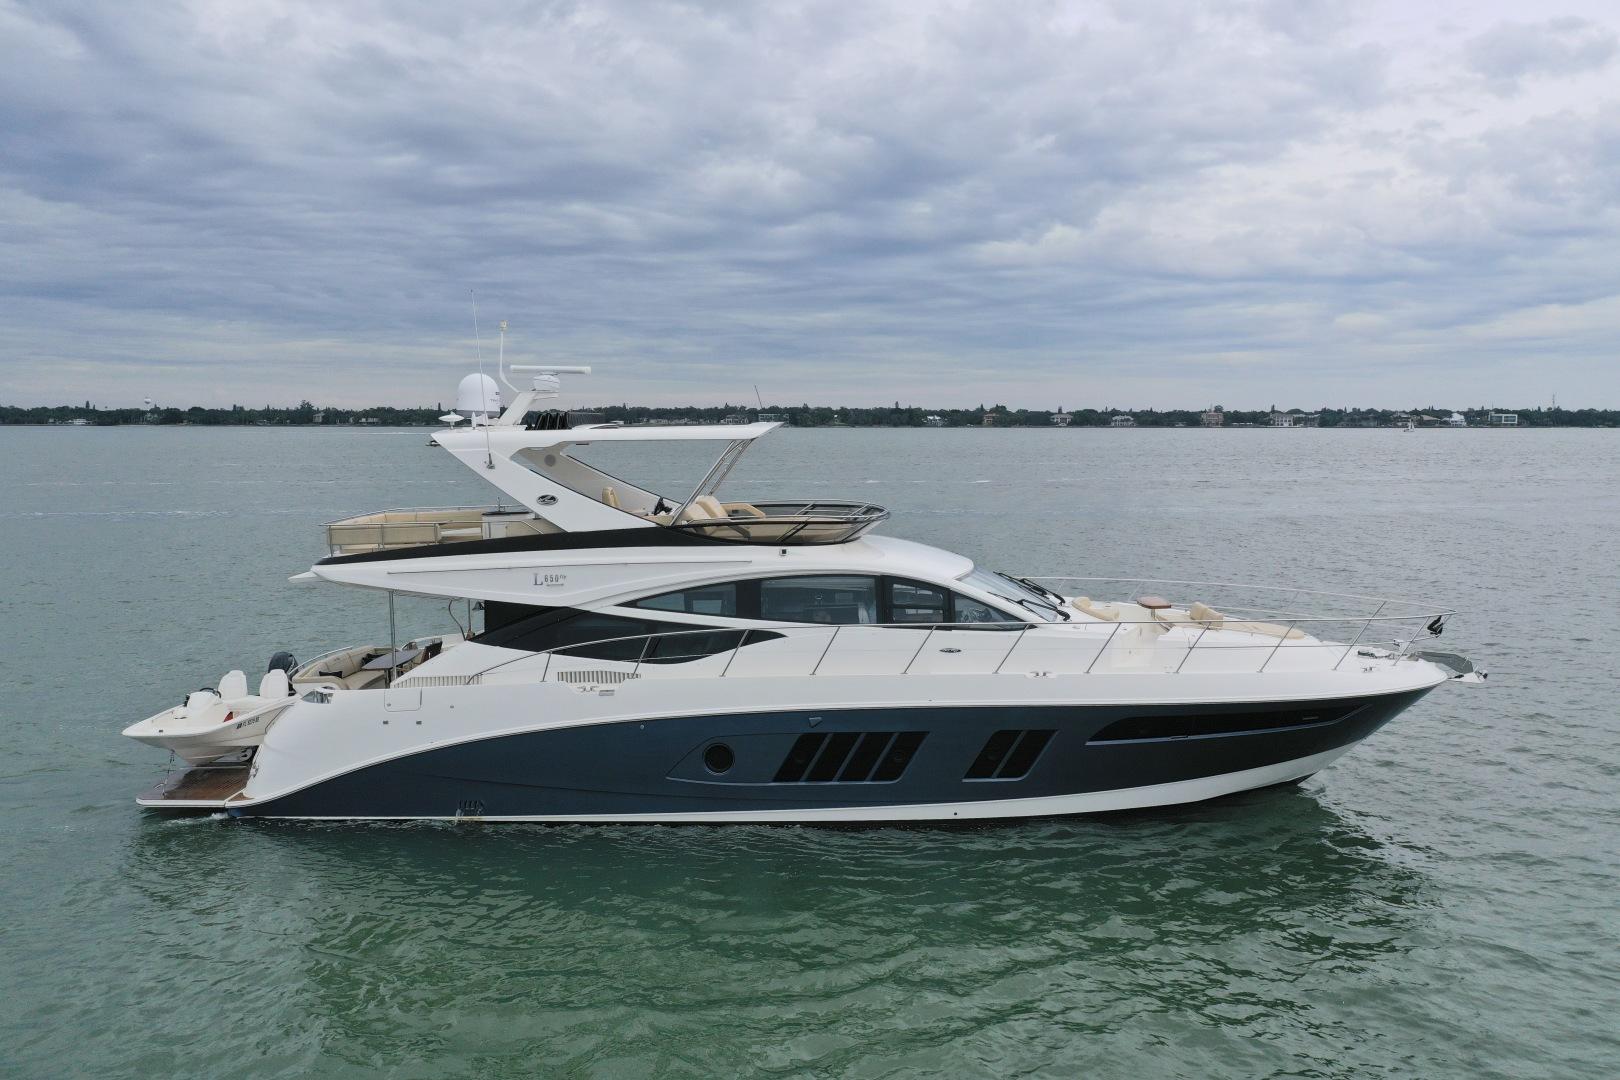 Sea Ray-L650 2016-3x's the Charm Longboat Key-Florida-United States-2016 Sea Ray L650 -1251879 | Thumbnail